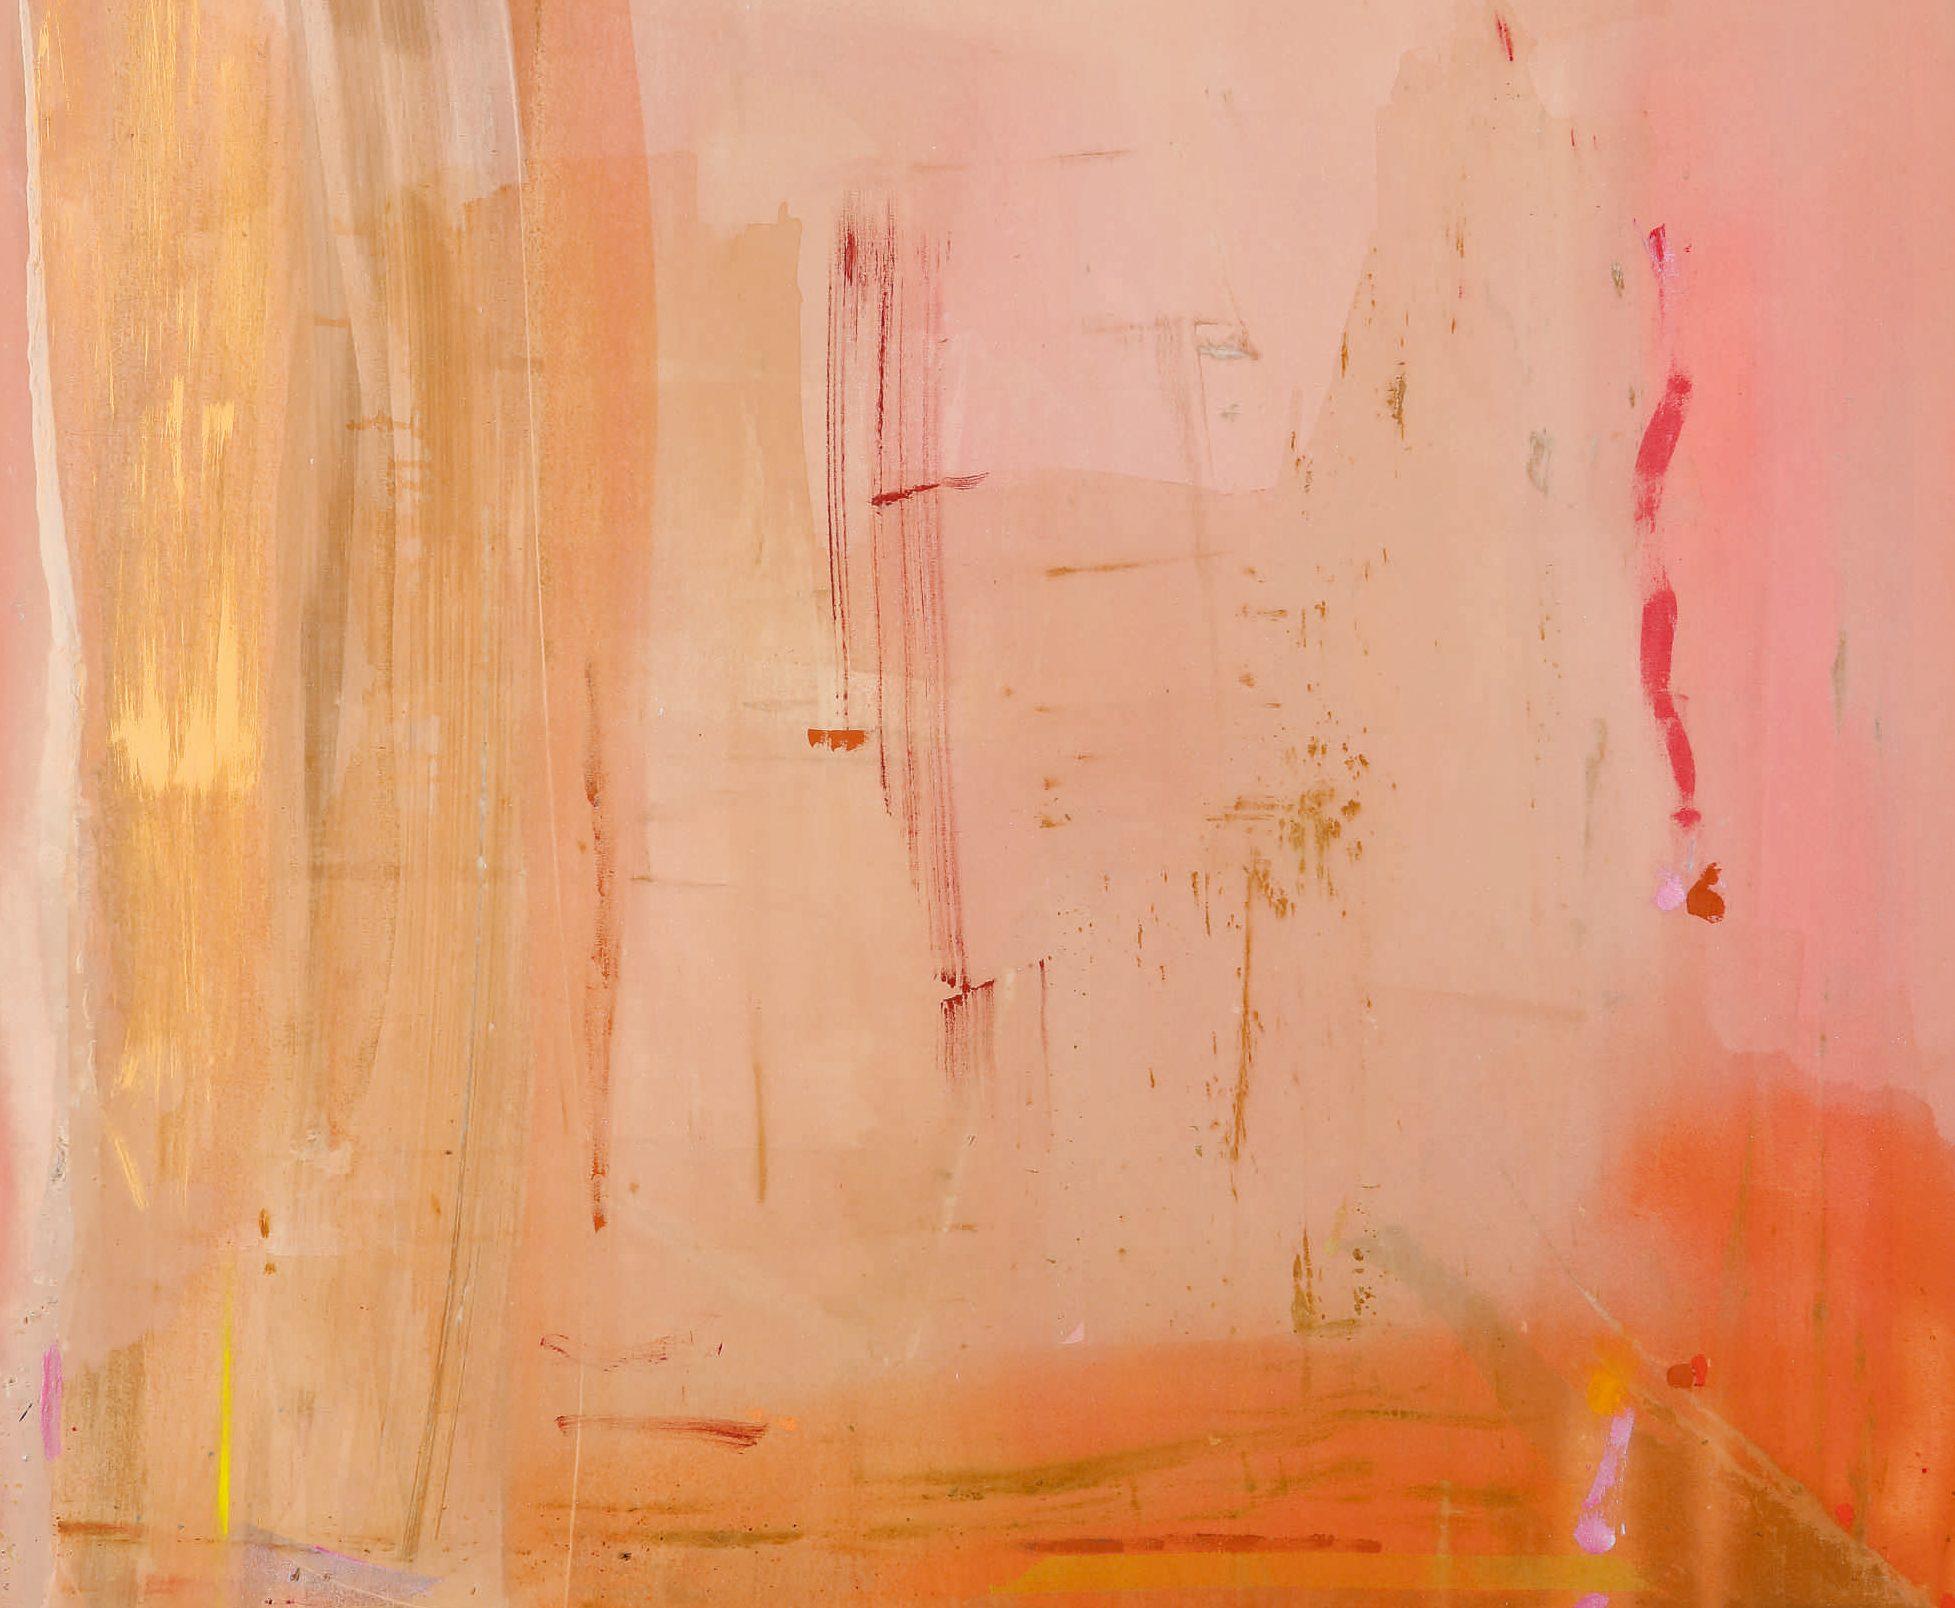 Helen Frankenthaler, 'Persia', 1978.